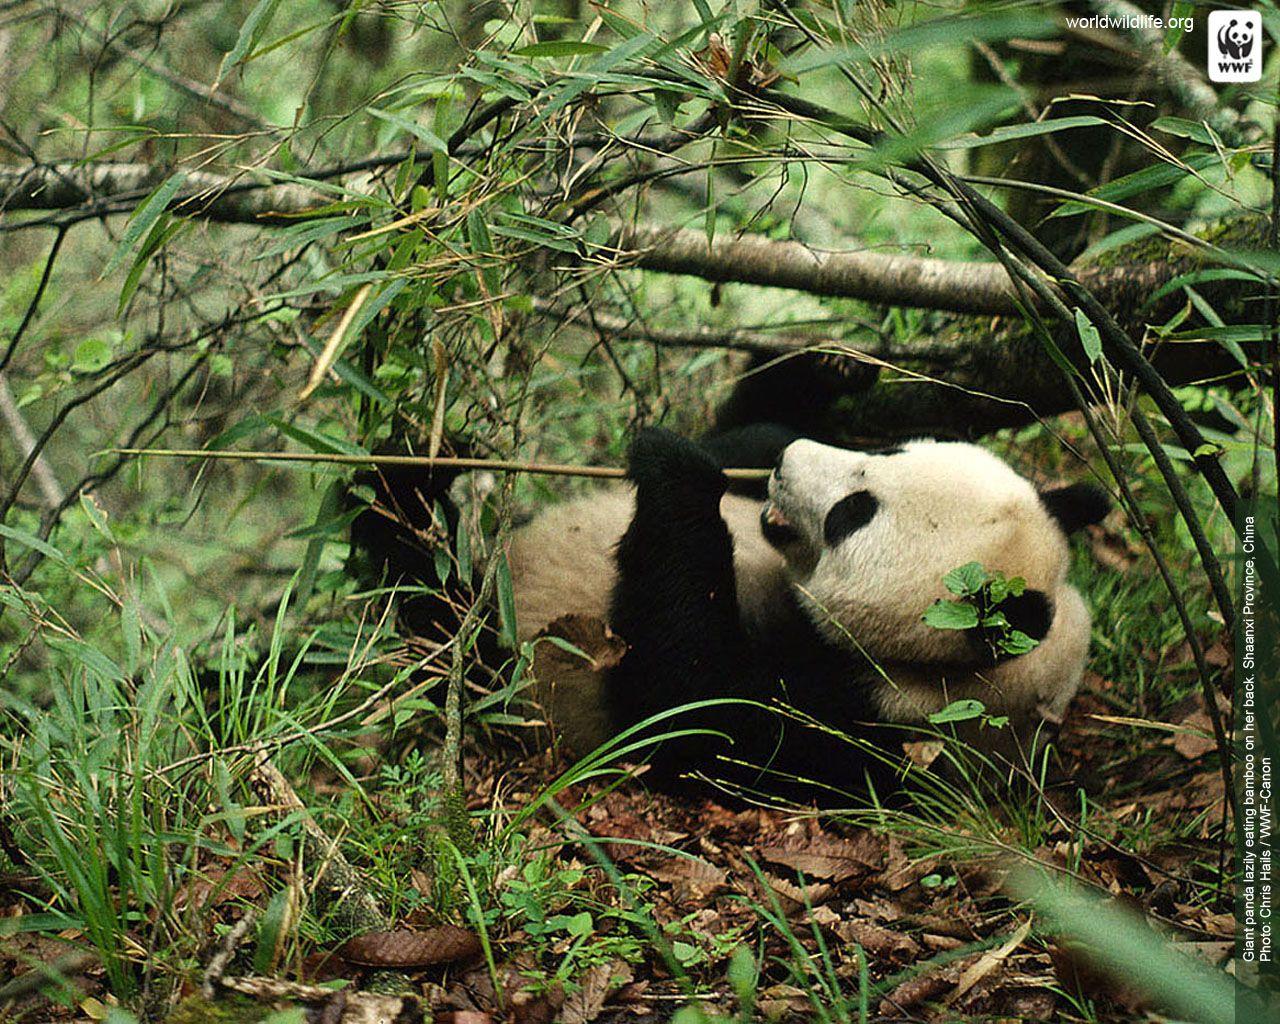 Panda Wallpaper Wwf With Images Panda Wallpapers Wildlife